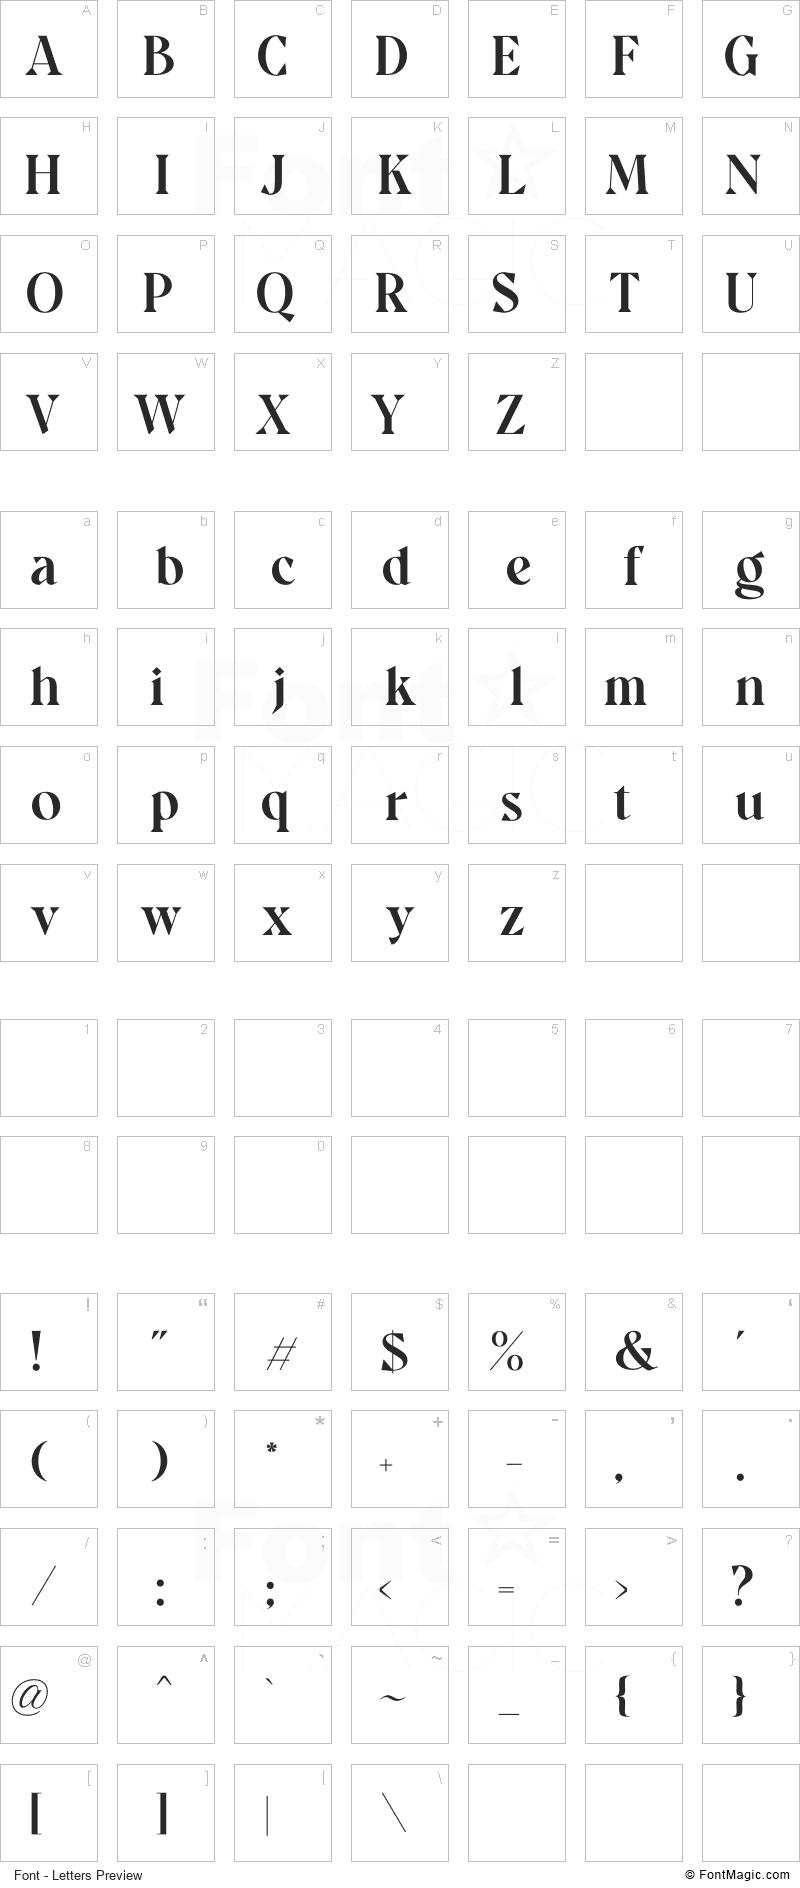 Quatro Font - All Latters Preview Chart